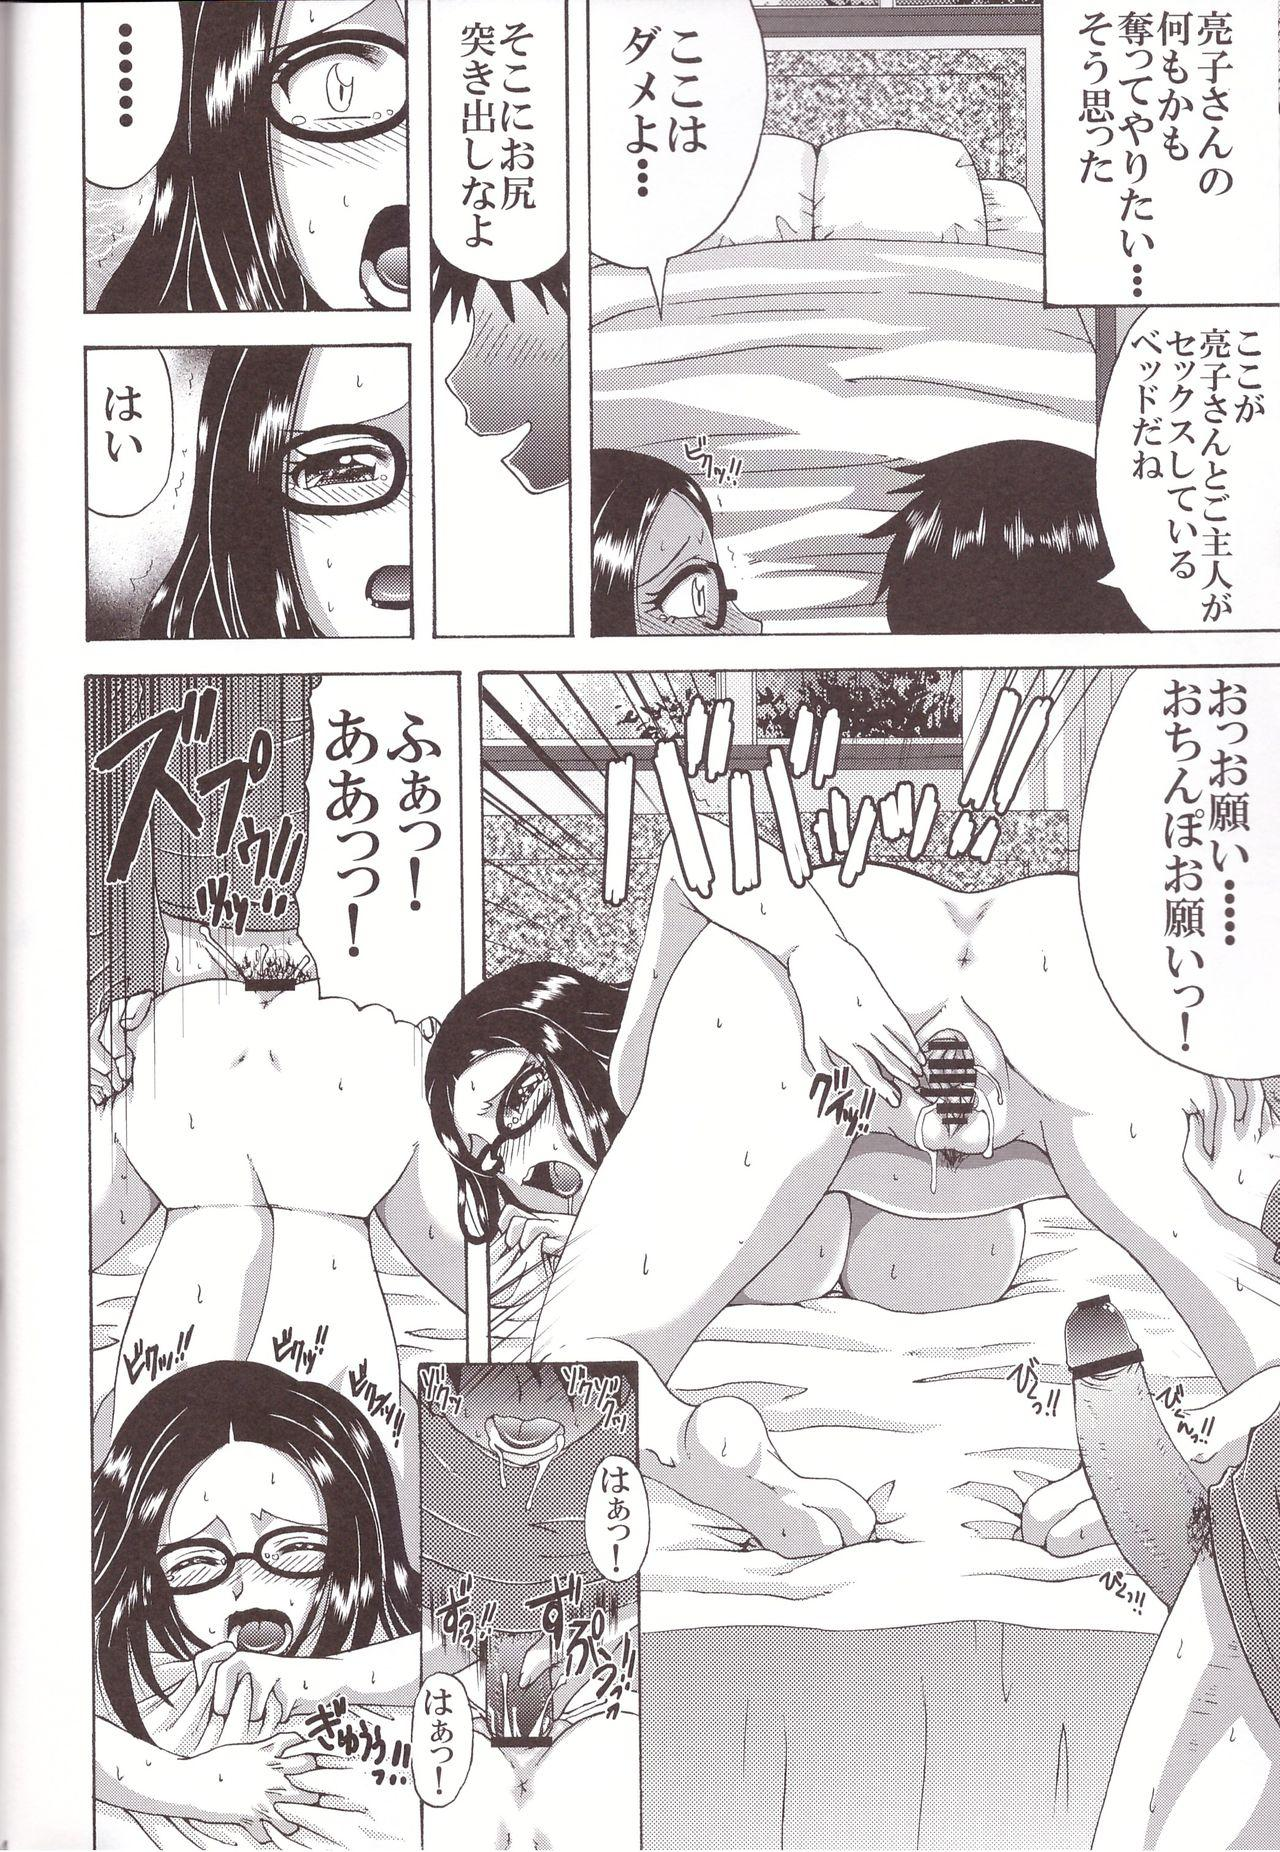 Tsuma koi2 13